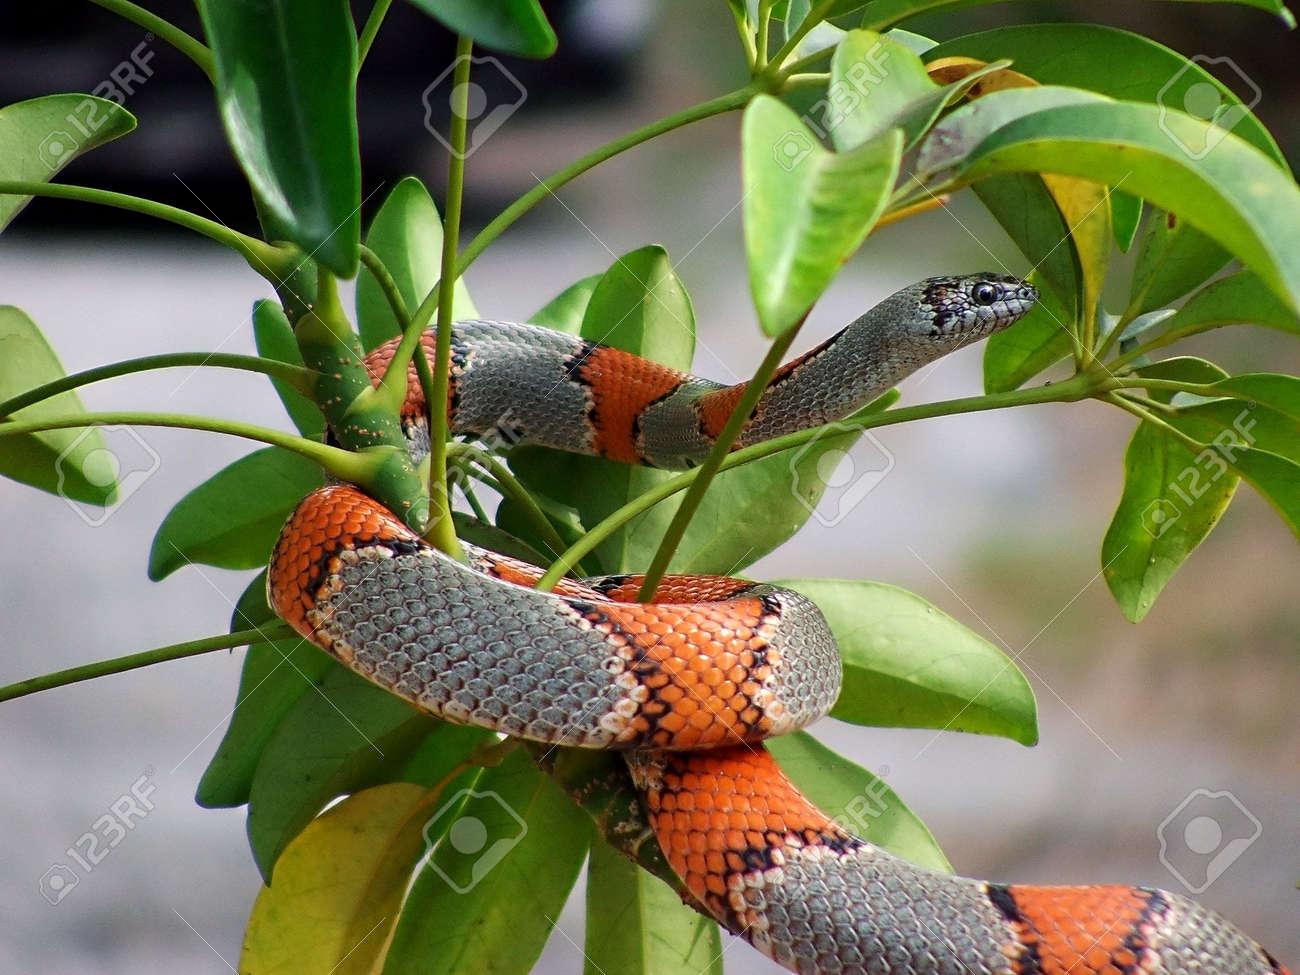 phobia of snakes stock photos royalty free phobia of snakes